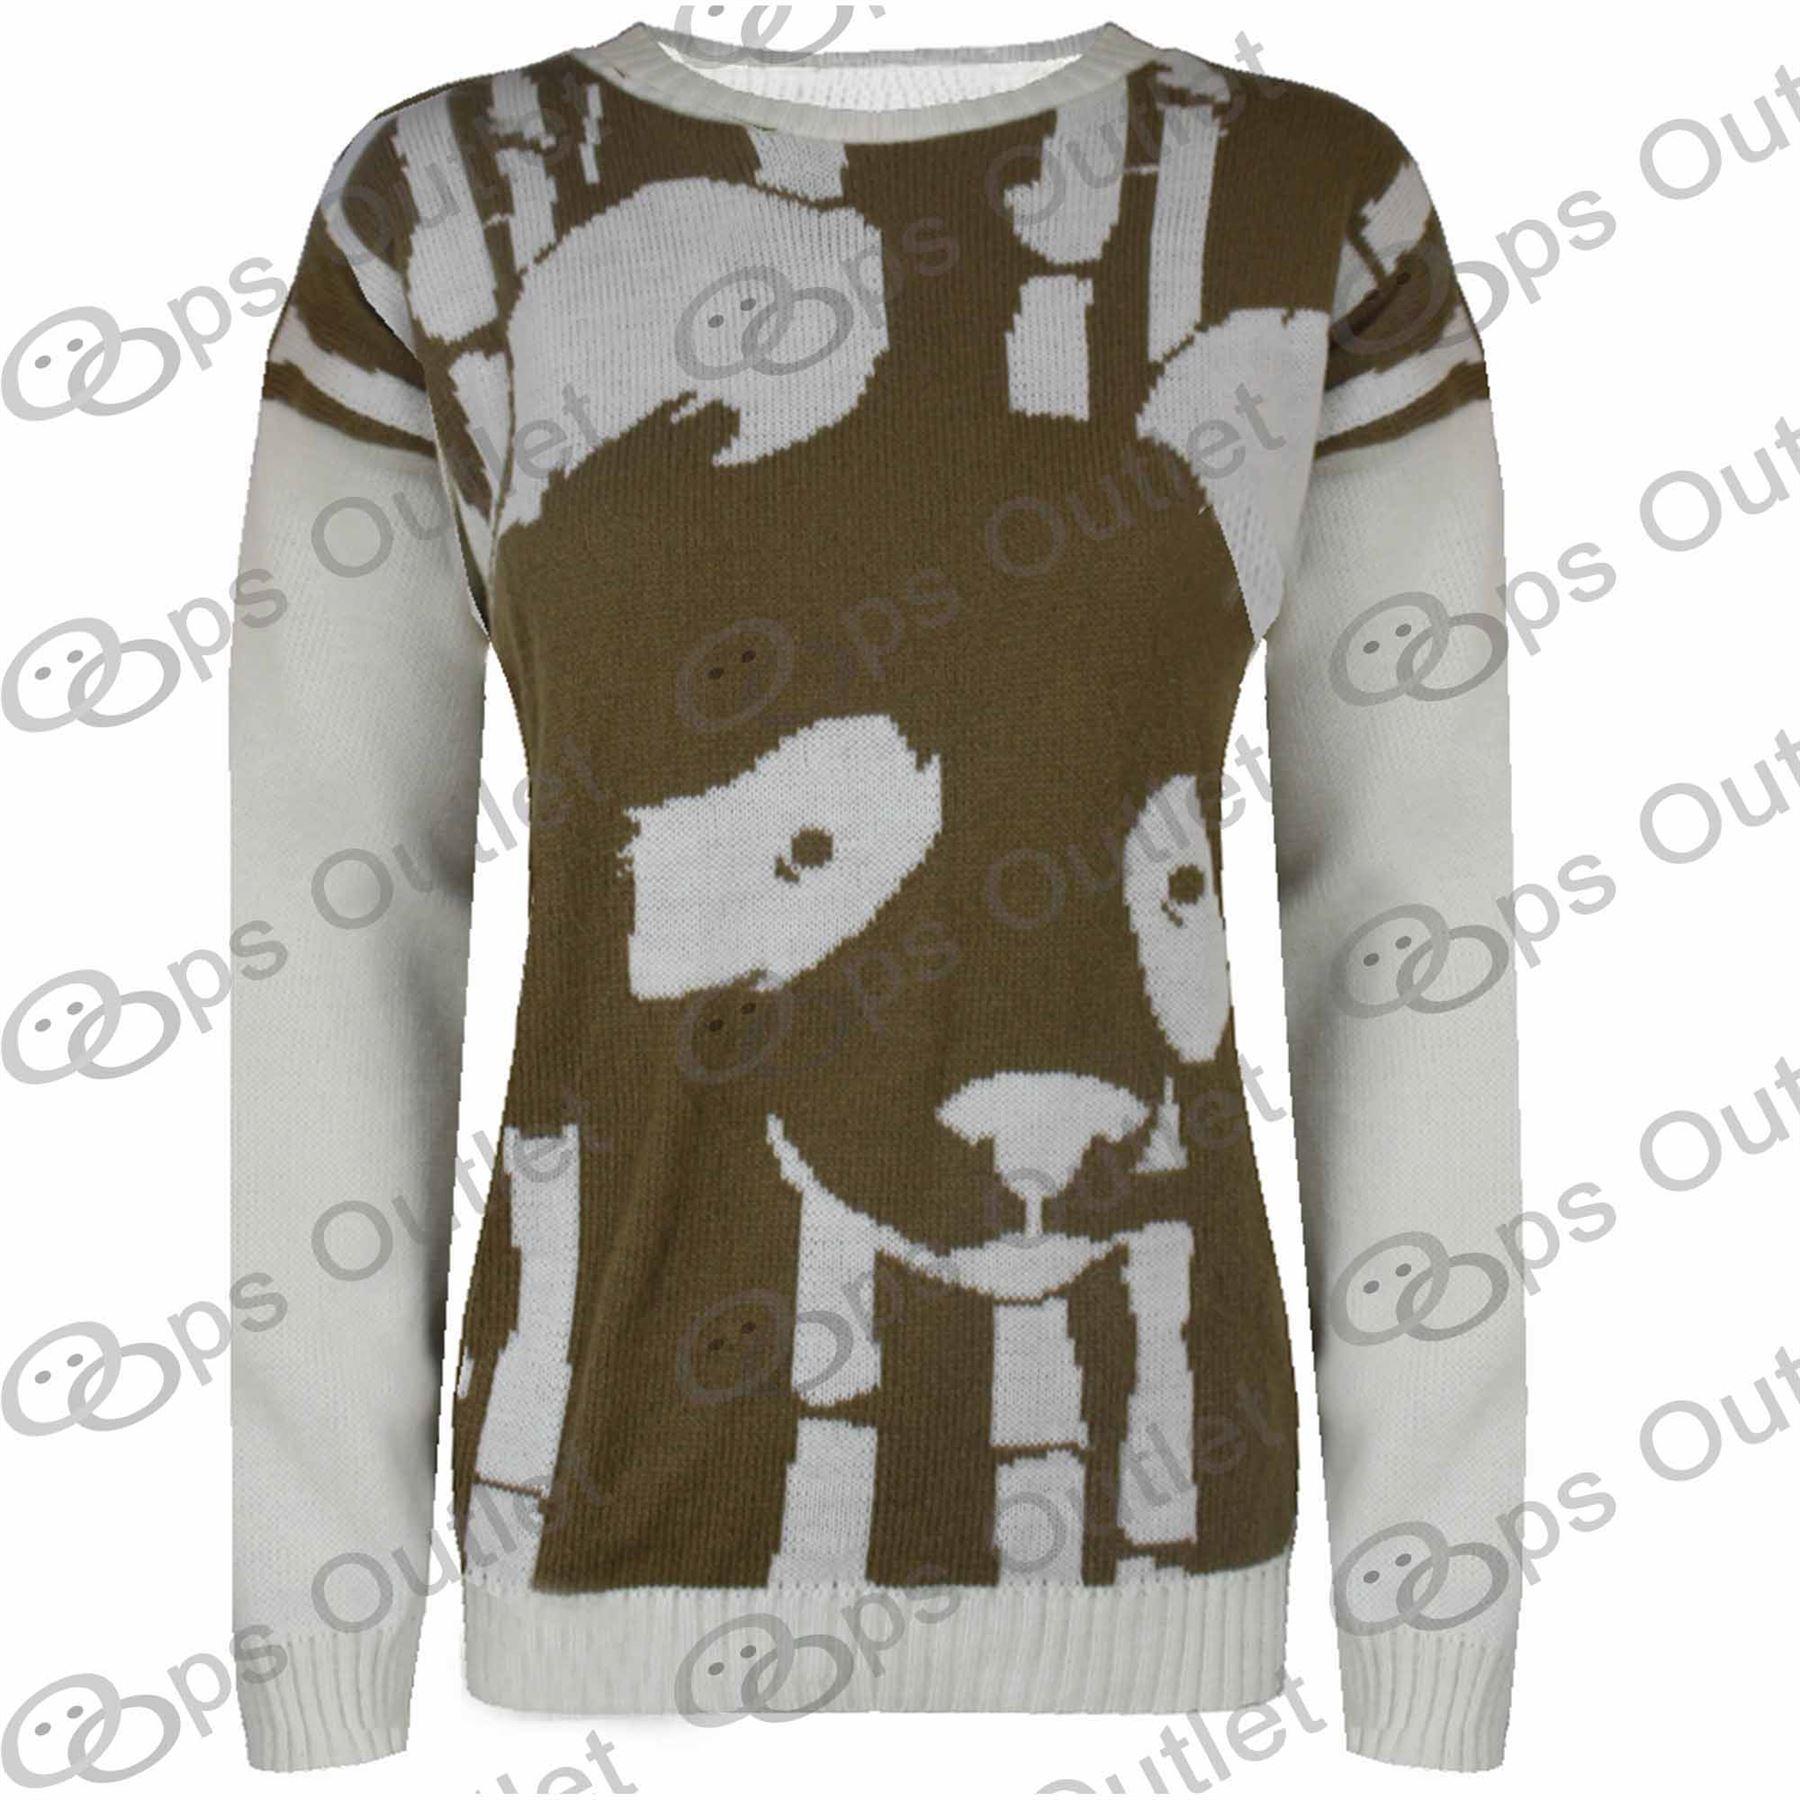 Knitting Pattern Panda Jumper : Ladies Long Sleeves Panda Face Girls Womens Knitted Pullover Sweater Jumper T...